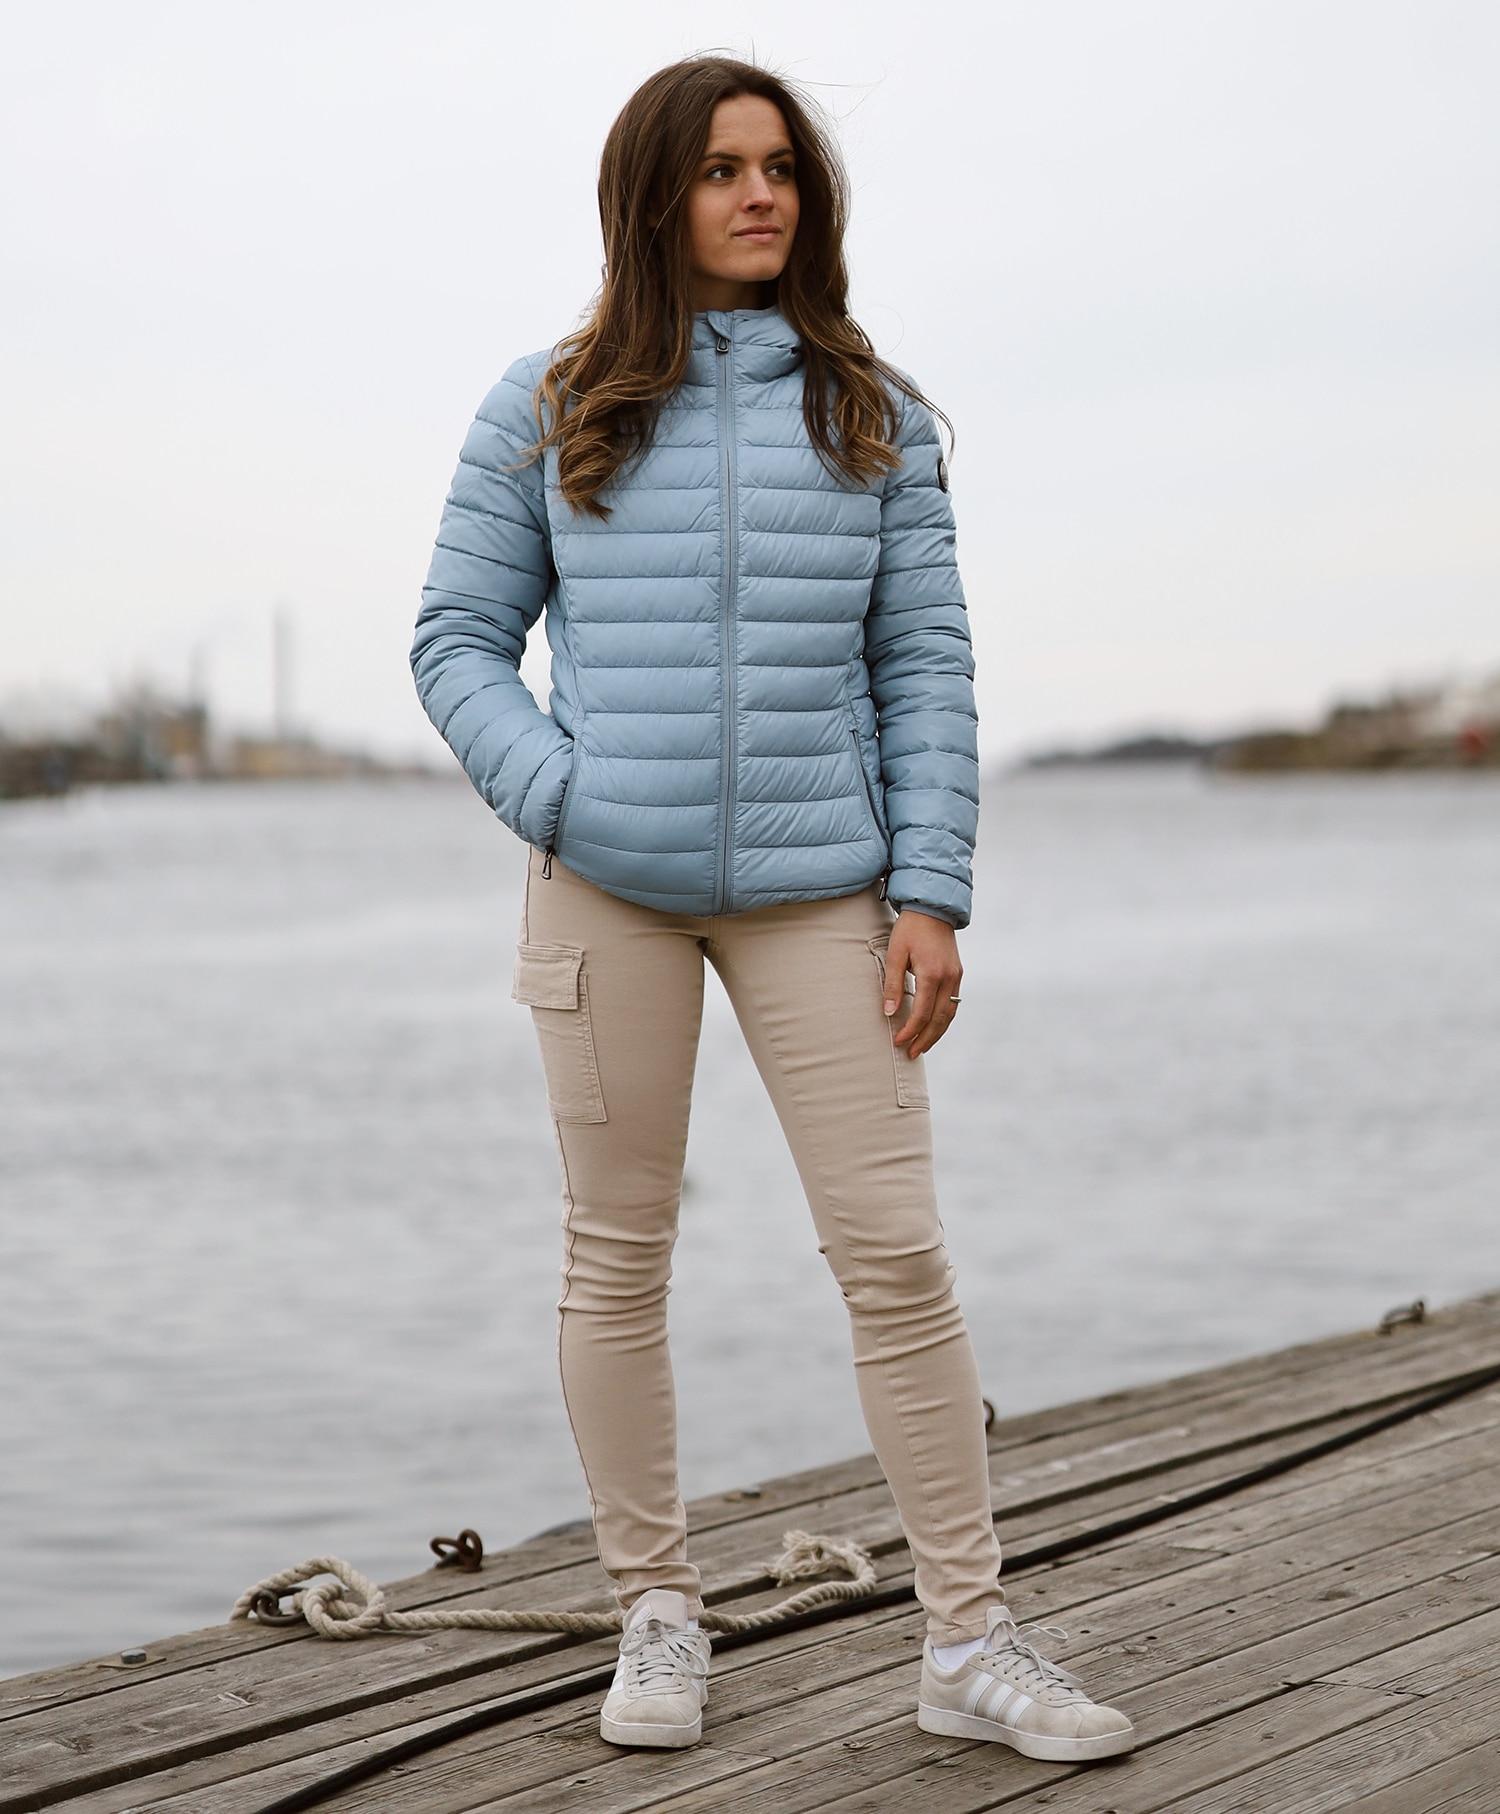 Artic North Jakke